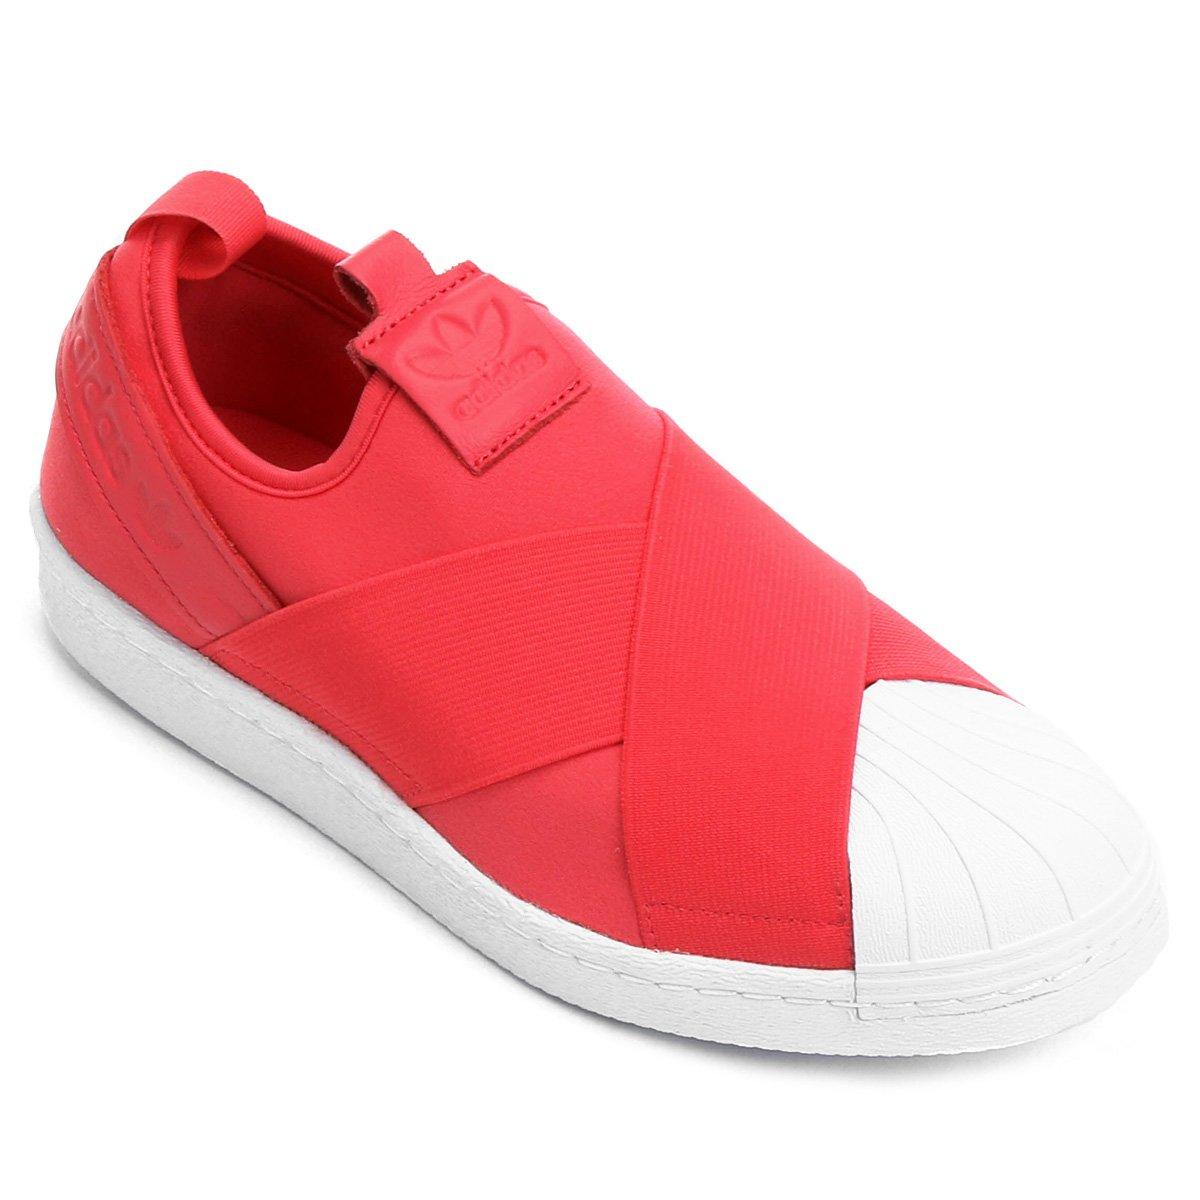 21f981a1c8 tênis adidas superstar slip on feminino  tênis couro adidas superstar  feminino pink+branco